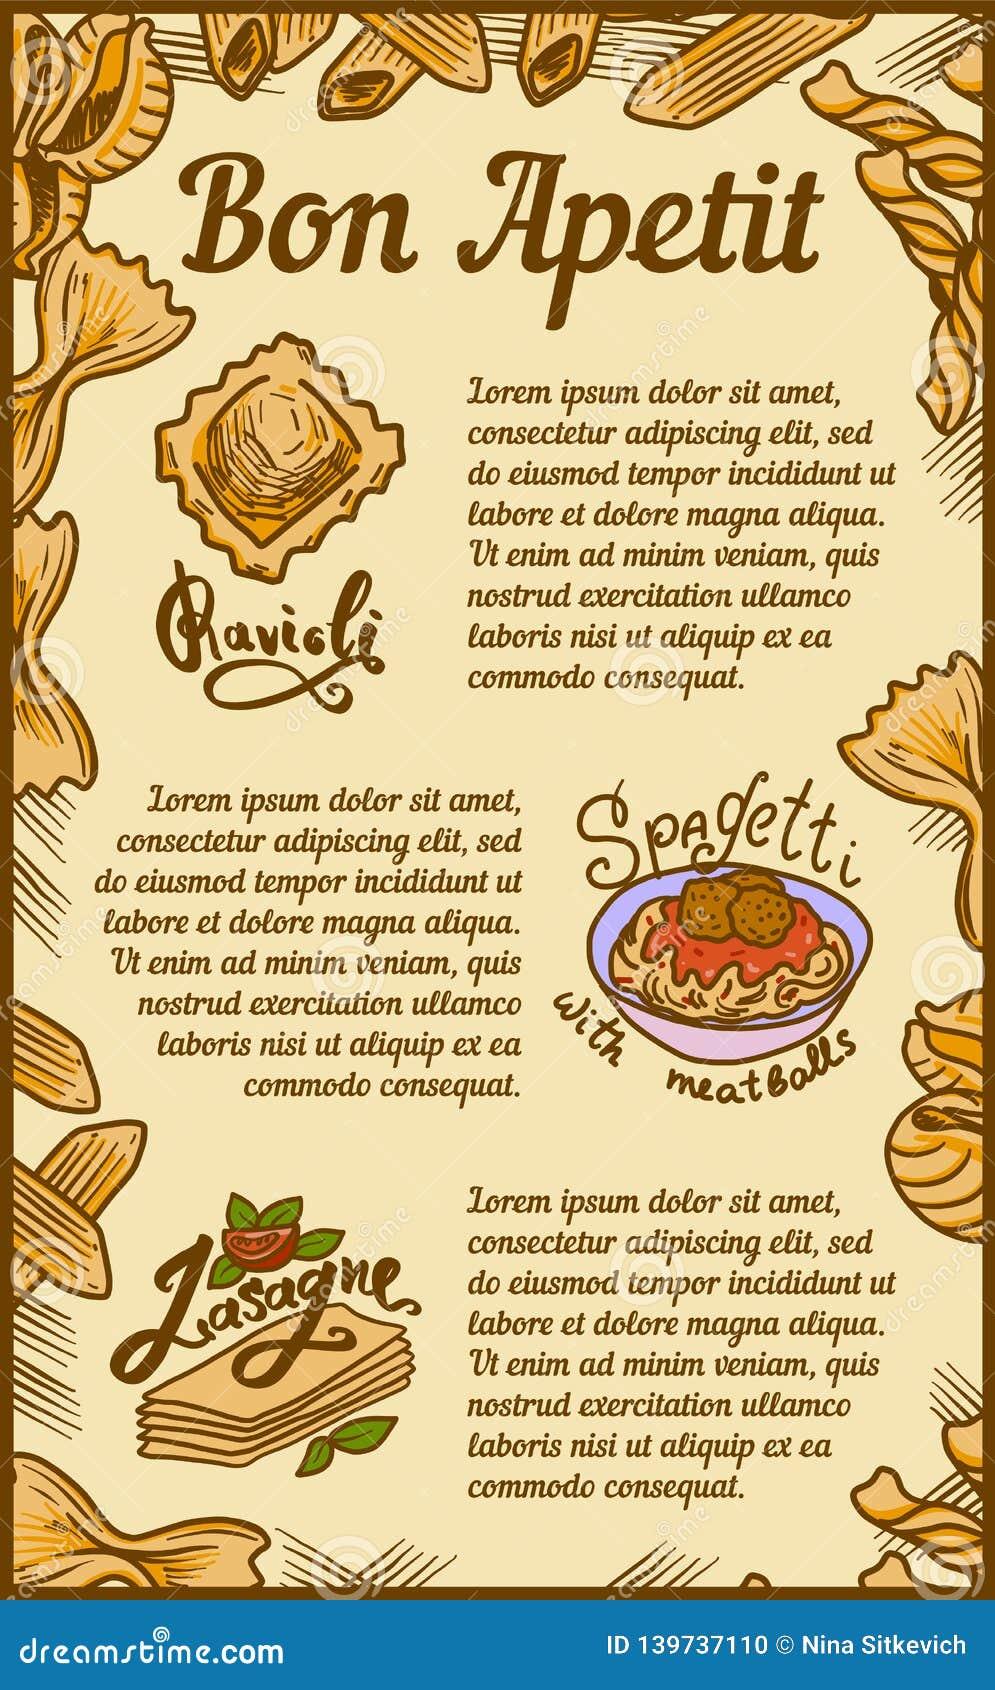 Bon Appetit Ravioli Lasagne Concept Banner Hand Drawn Style Stock Vector Illustration Of Italian Lasagna 139737110